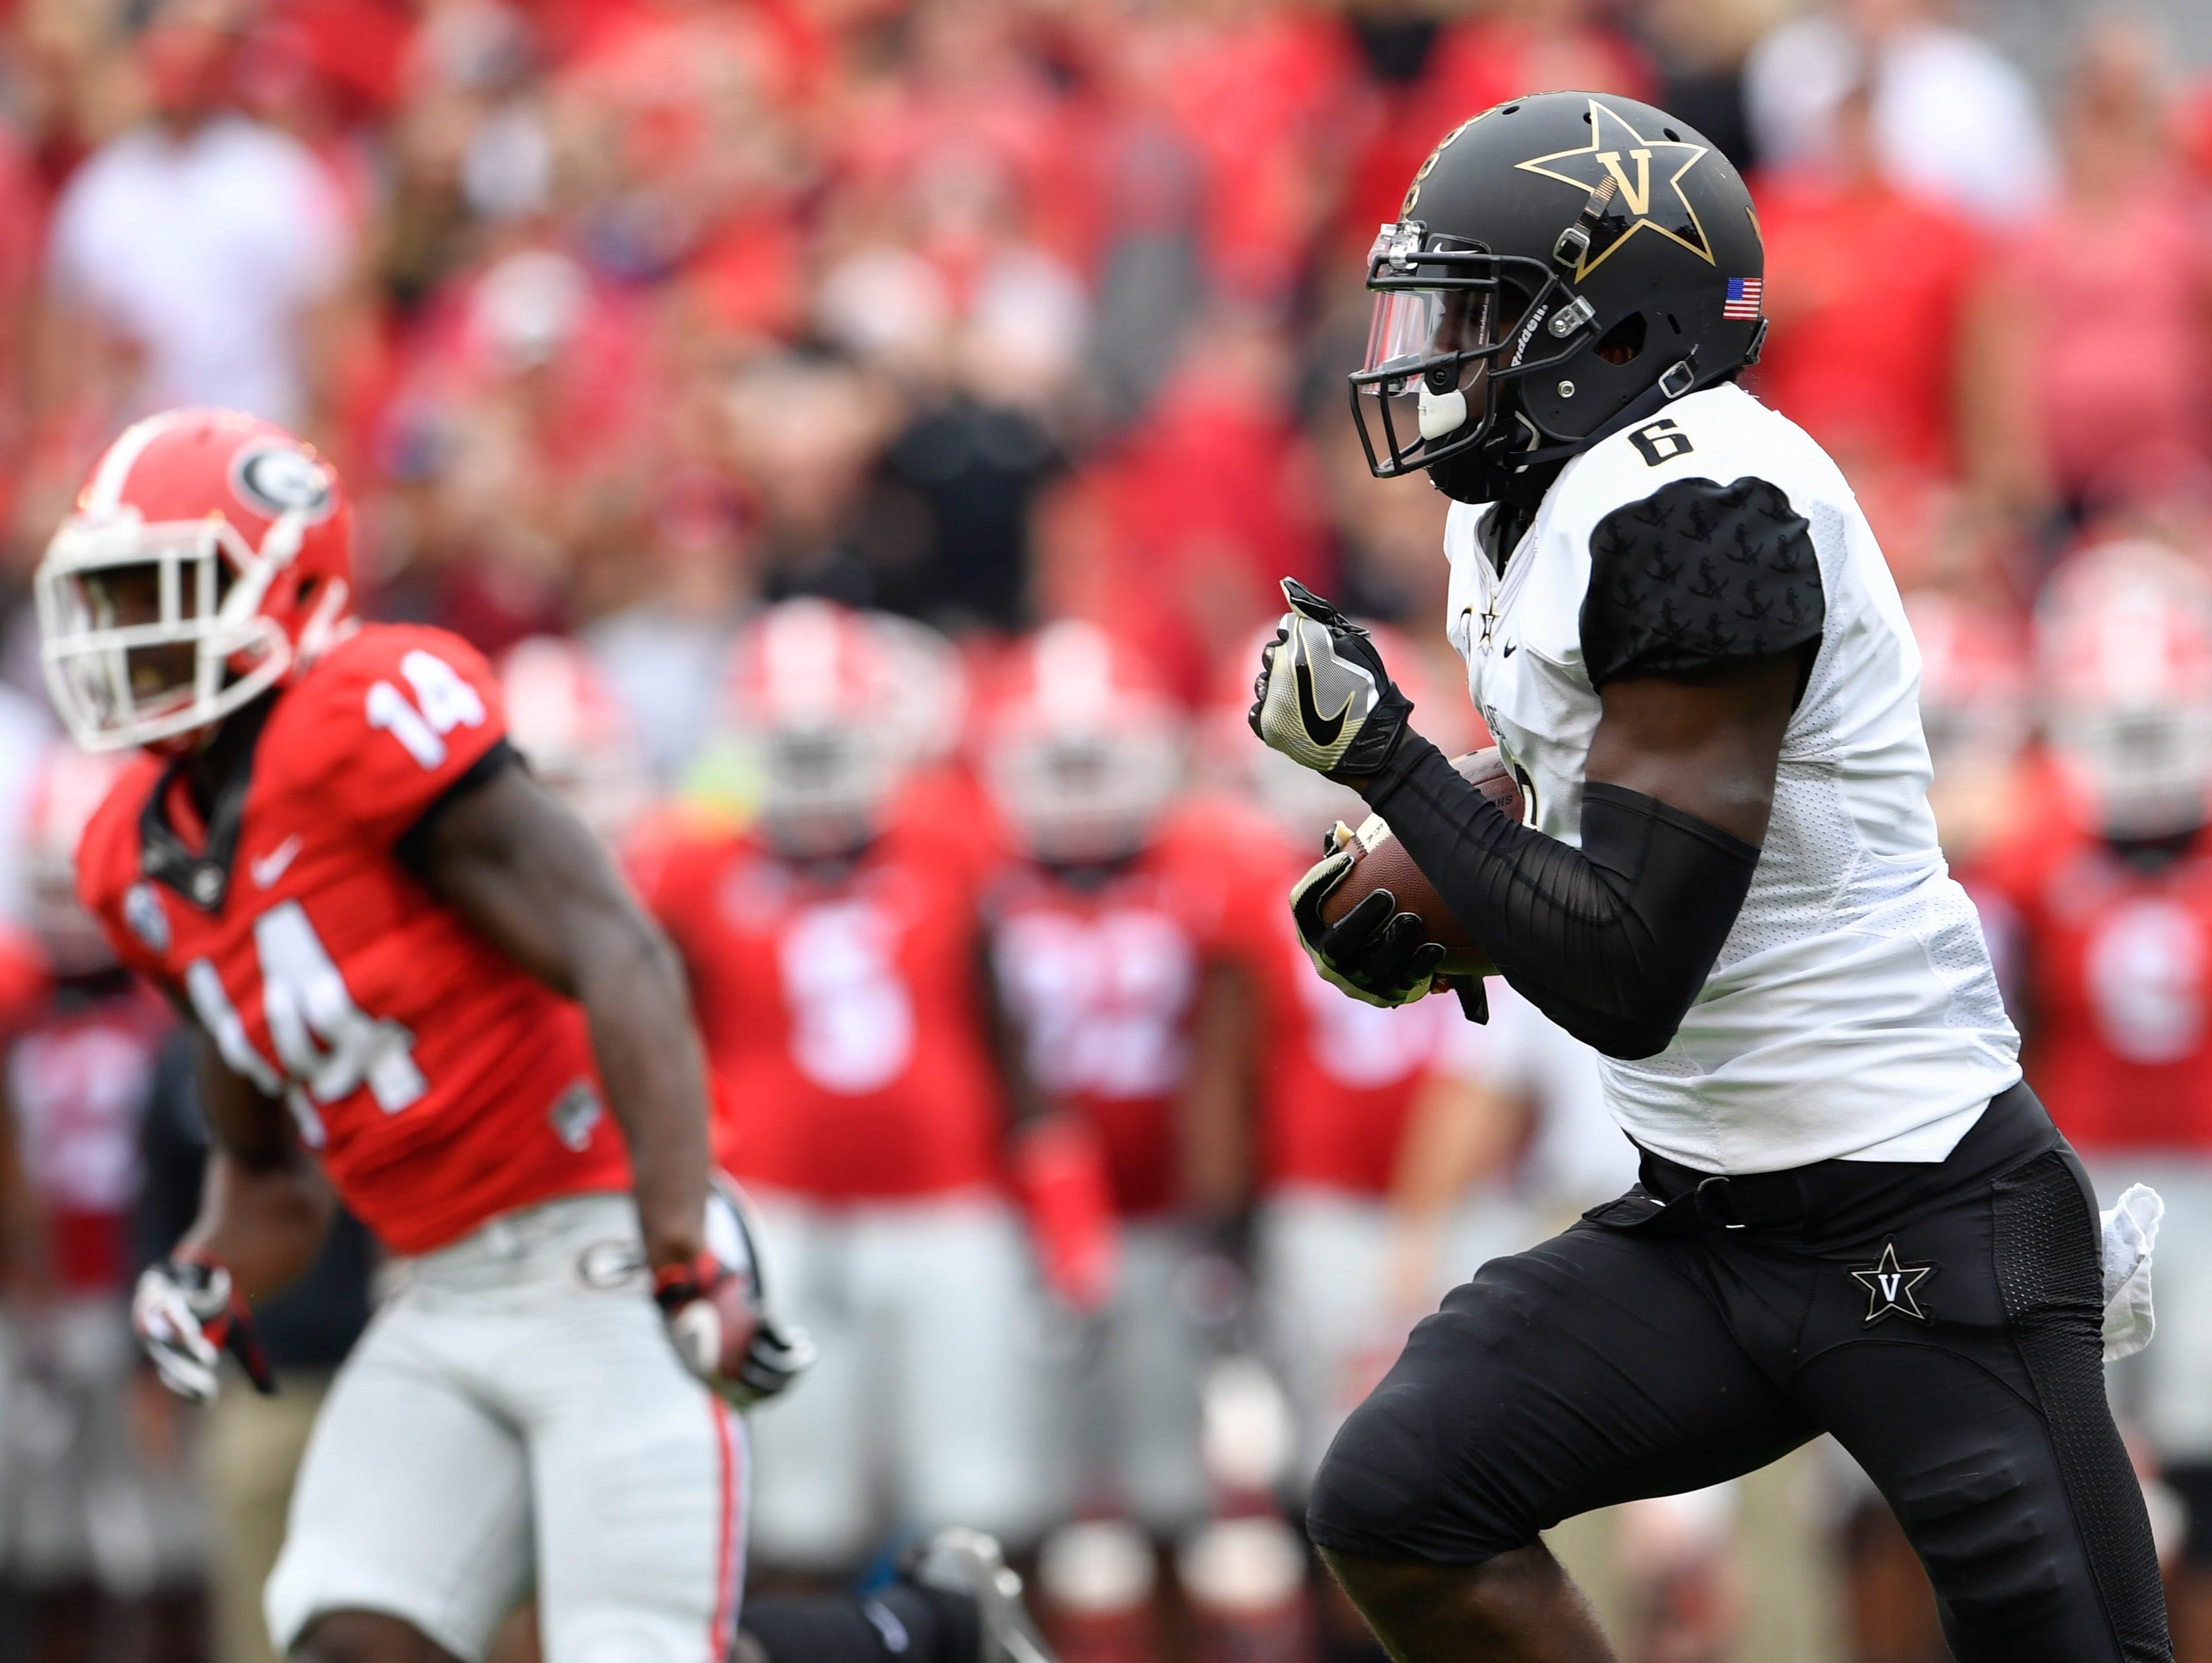 Vanderbilt's Darrius Sims (6) returns the opening kickoff 95 yards against Georgia last season.